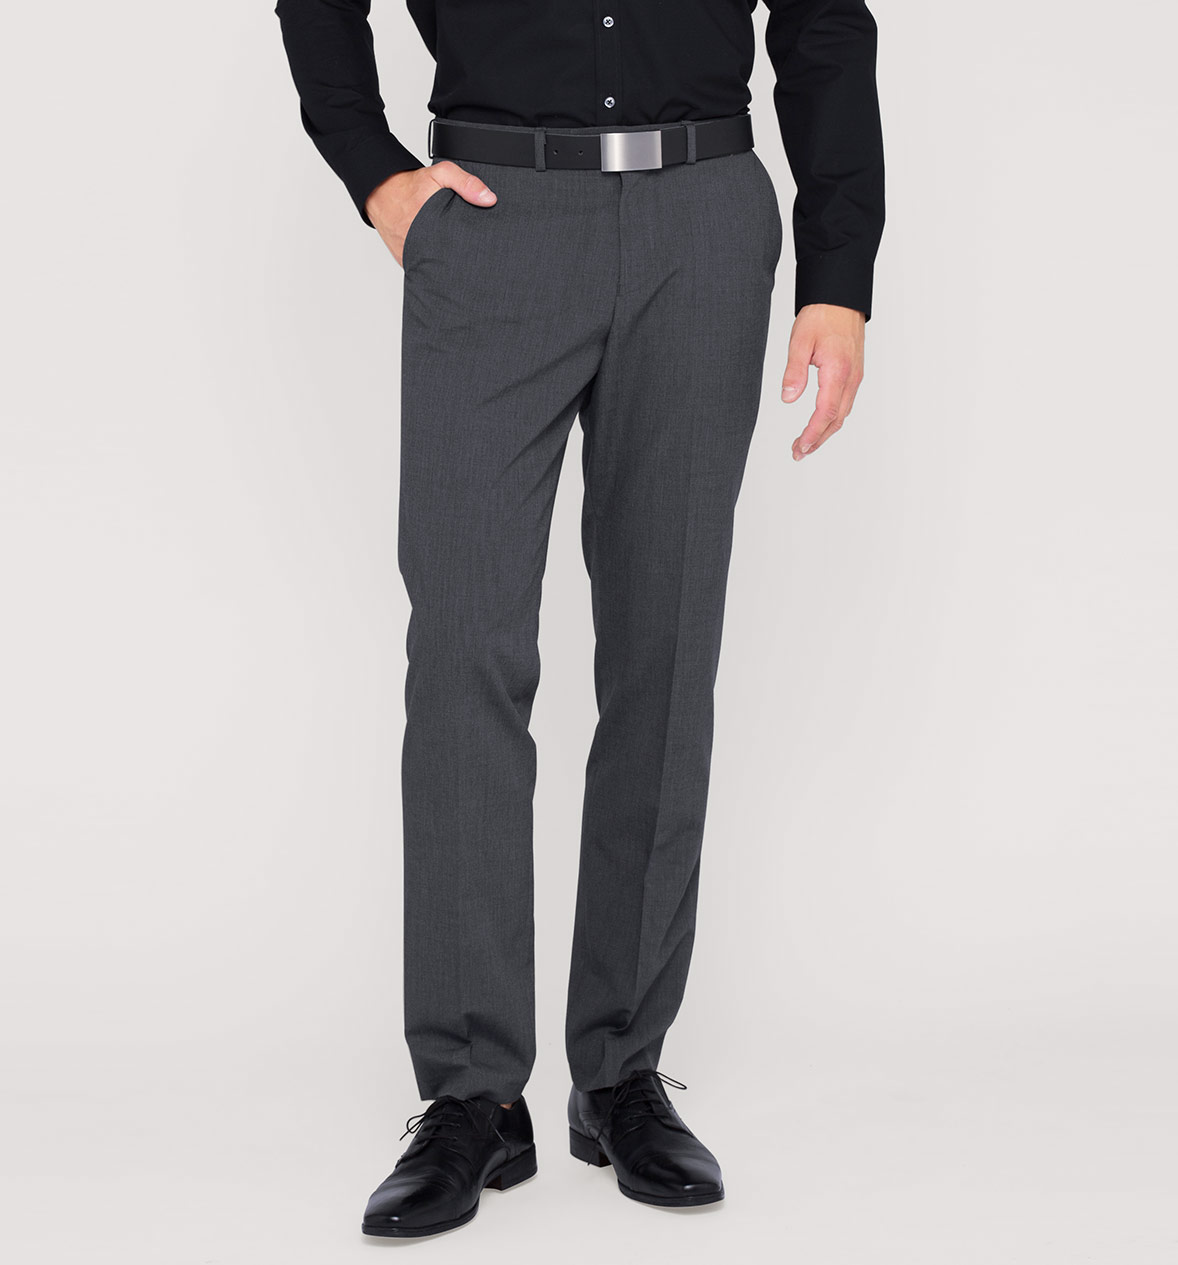 Pantalón Traje Hombre #1 PREMIUM